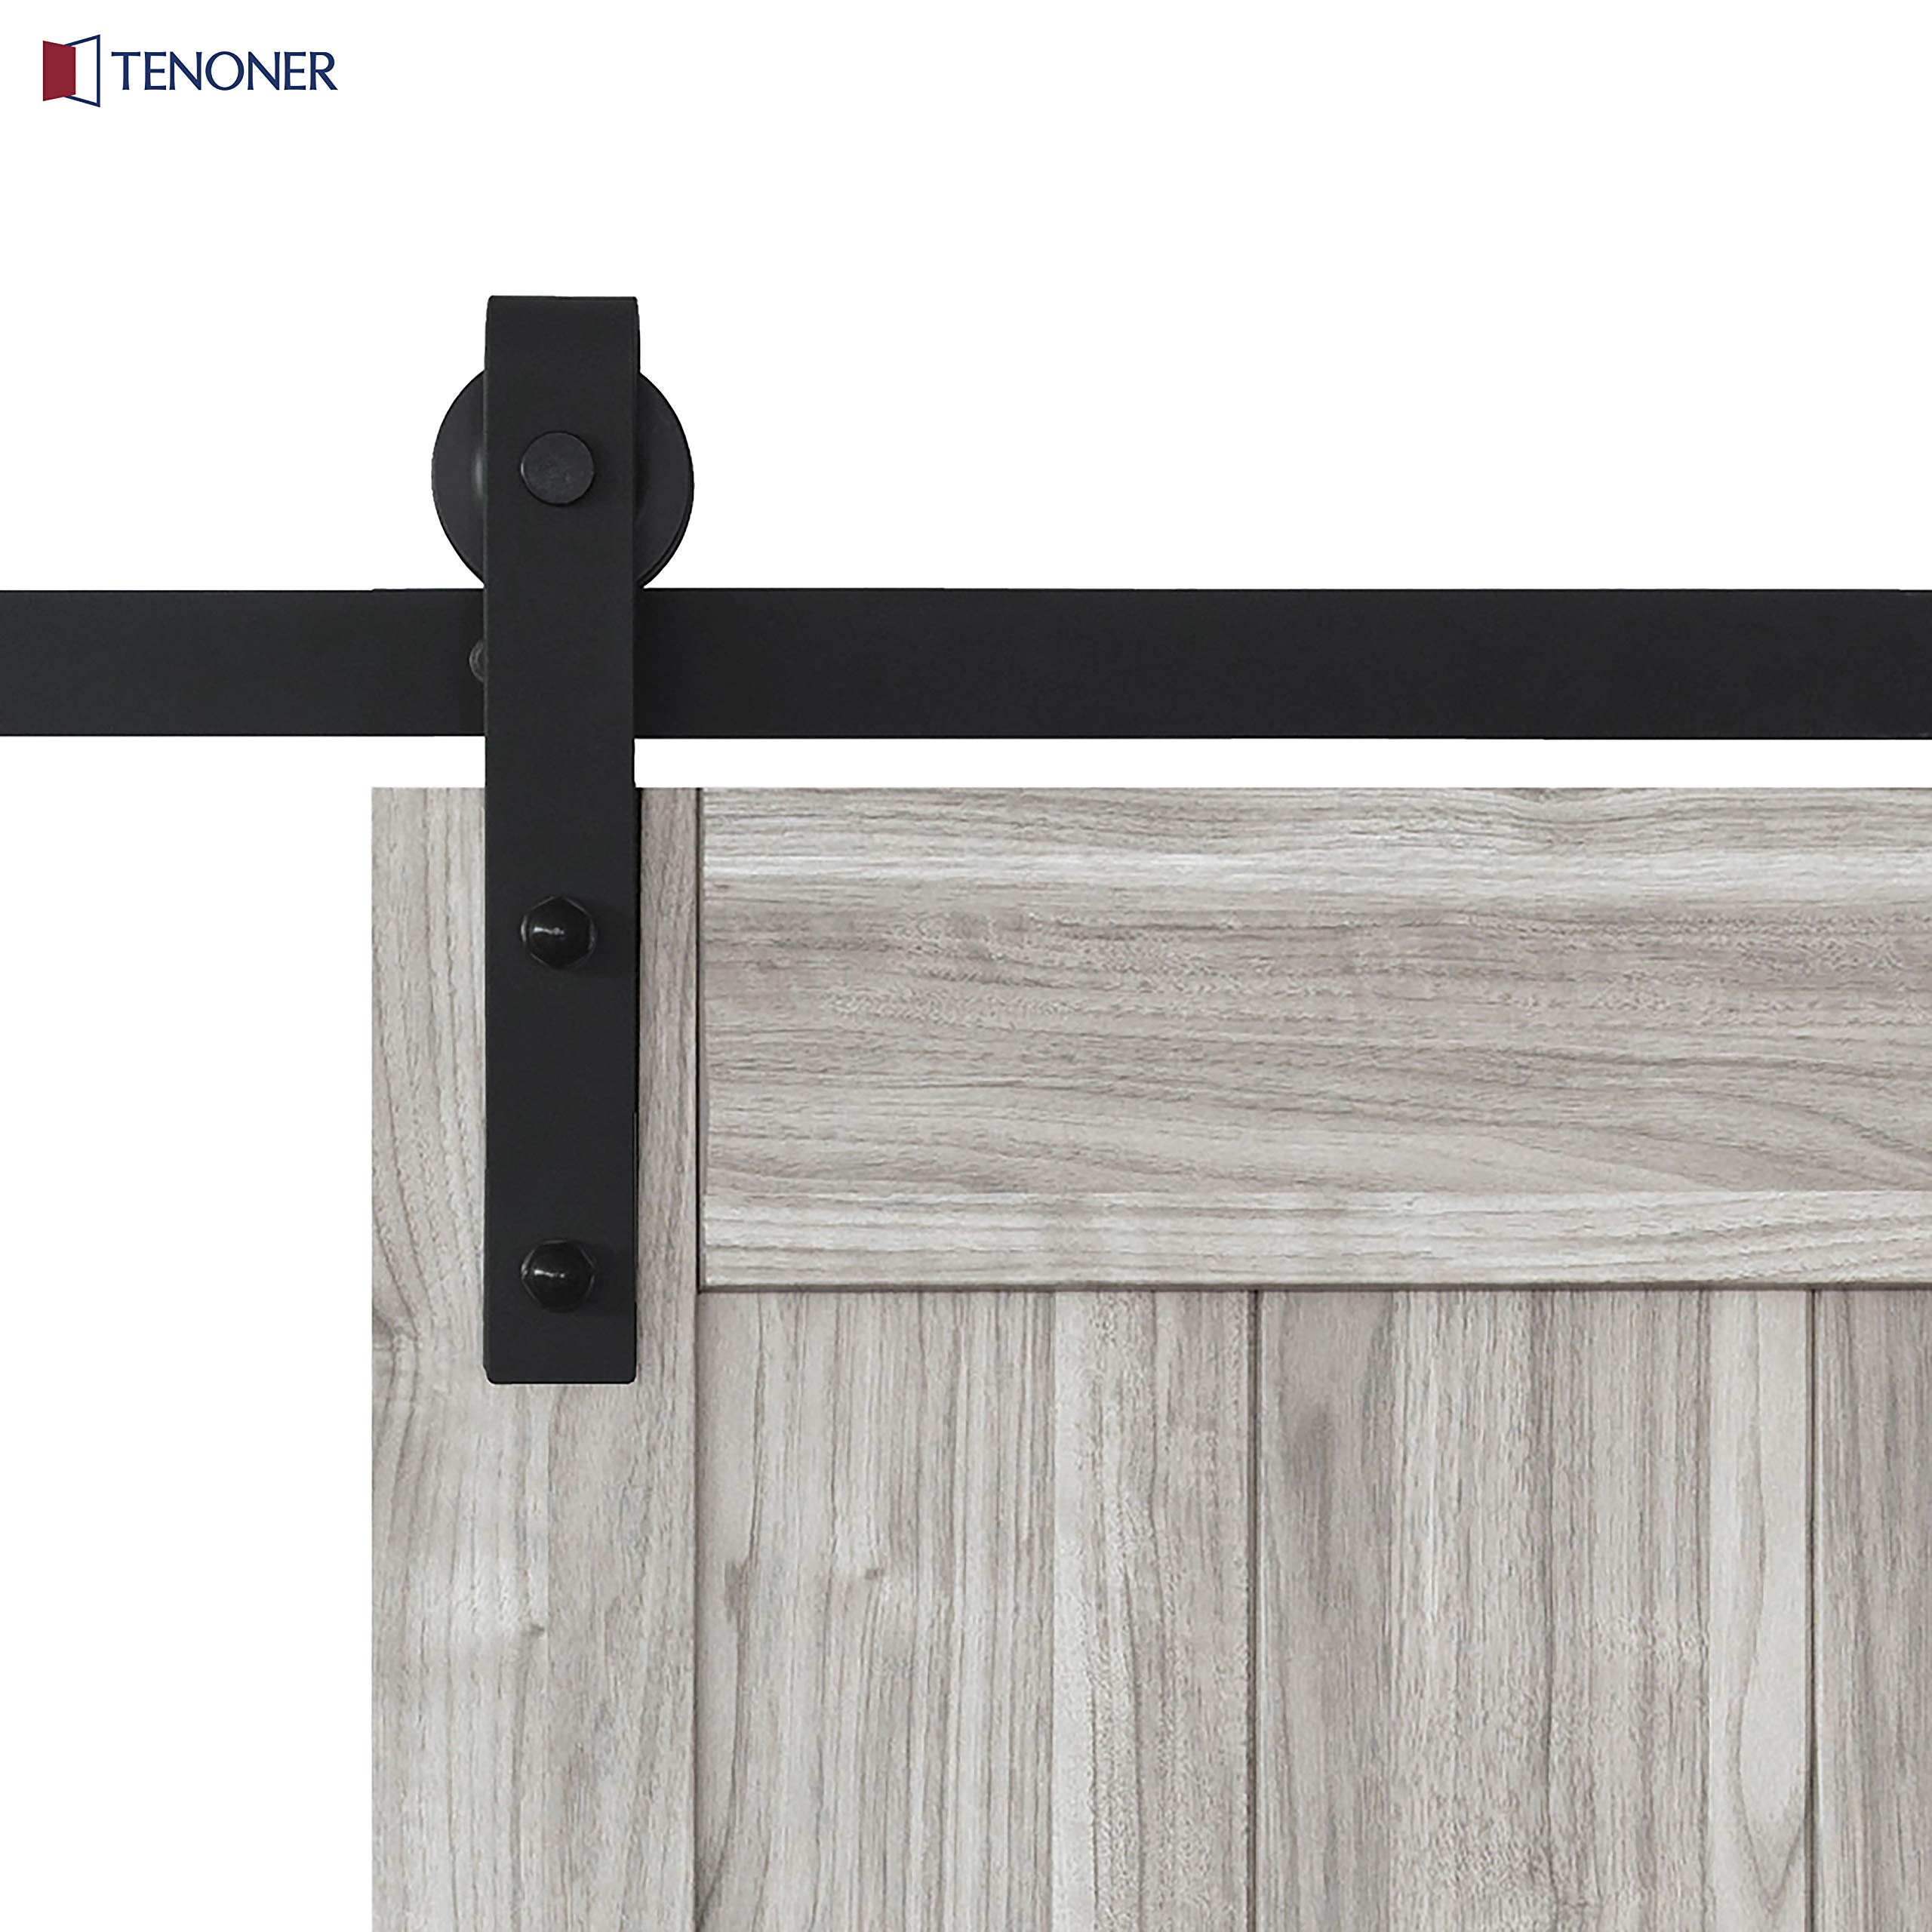 TENONER 36in x 84in Grey K-Frame Sliding Barn Door, 6.6ft Barn Door Hardware Kit & Handle Included by TENONER (Image #4)